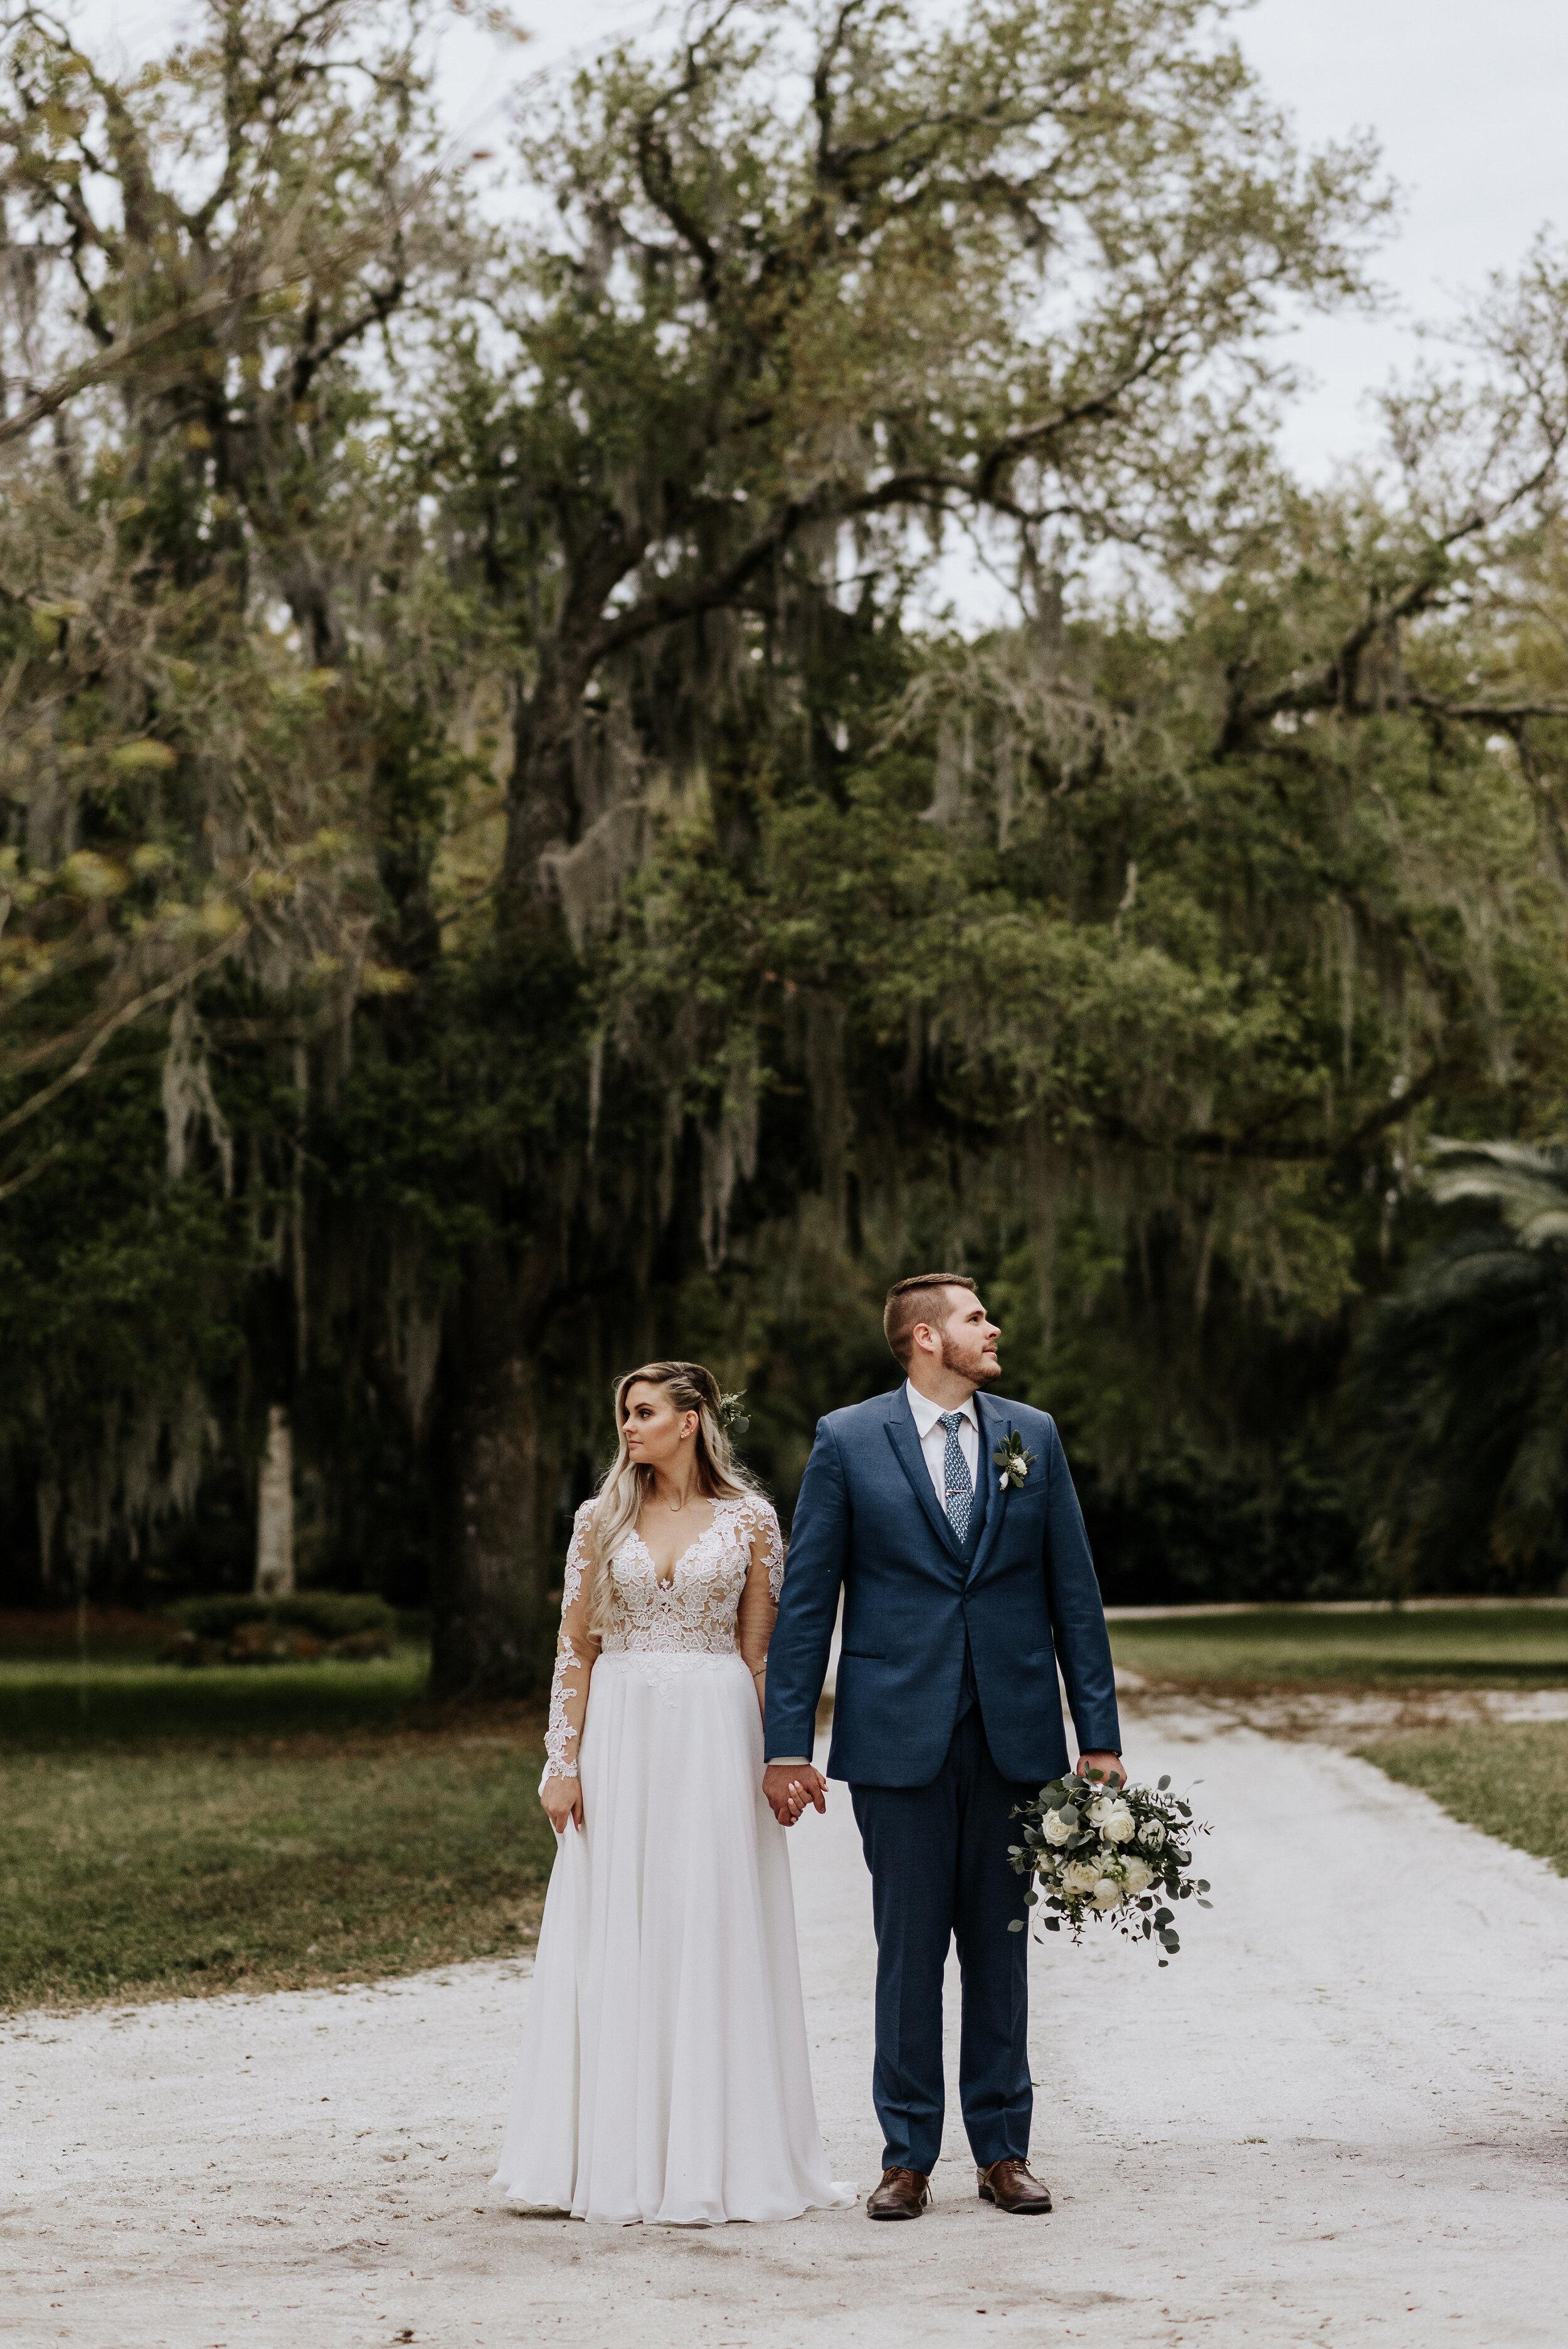 Mikenzi_Brad_Wedding_The_Delamater_House_New_Smyrna_Beach_Florida_Photography_by_V_5332.jpg